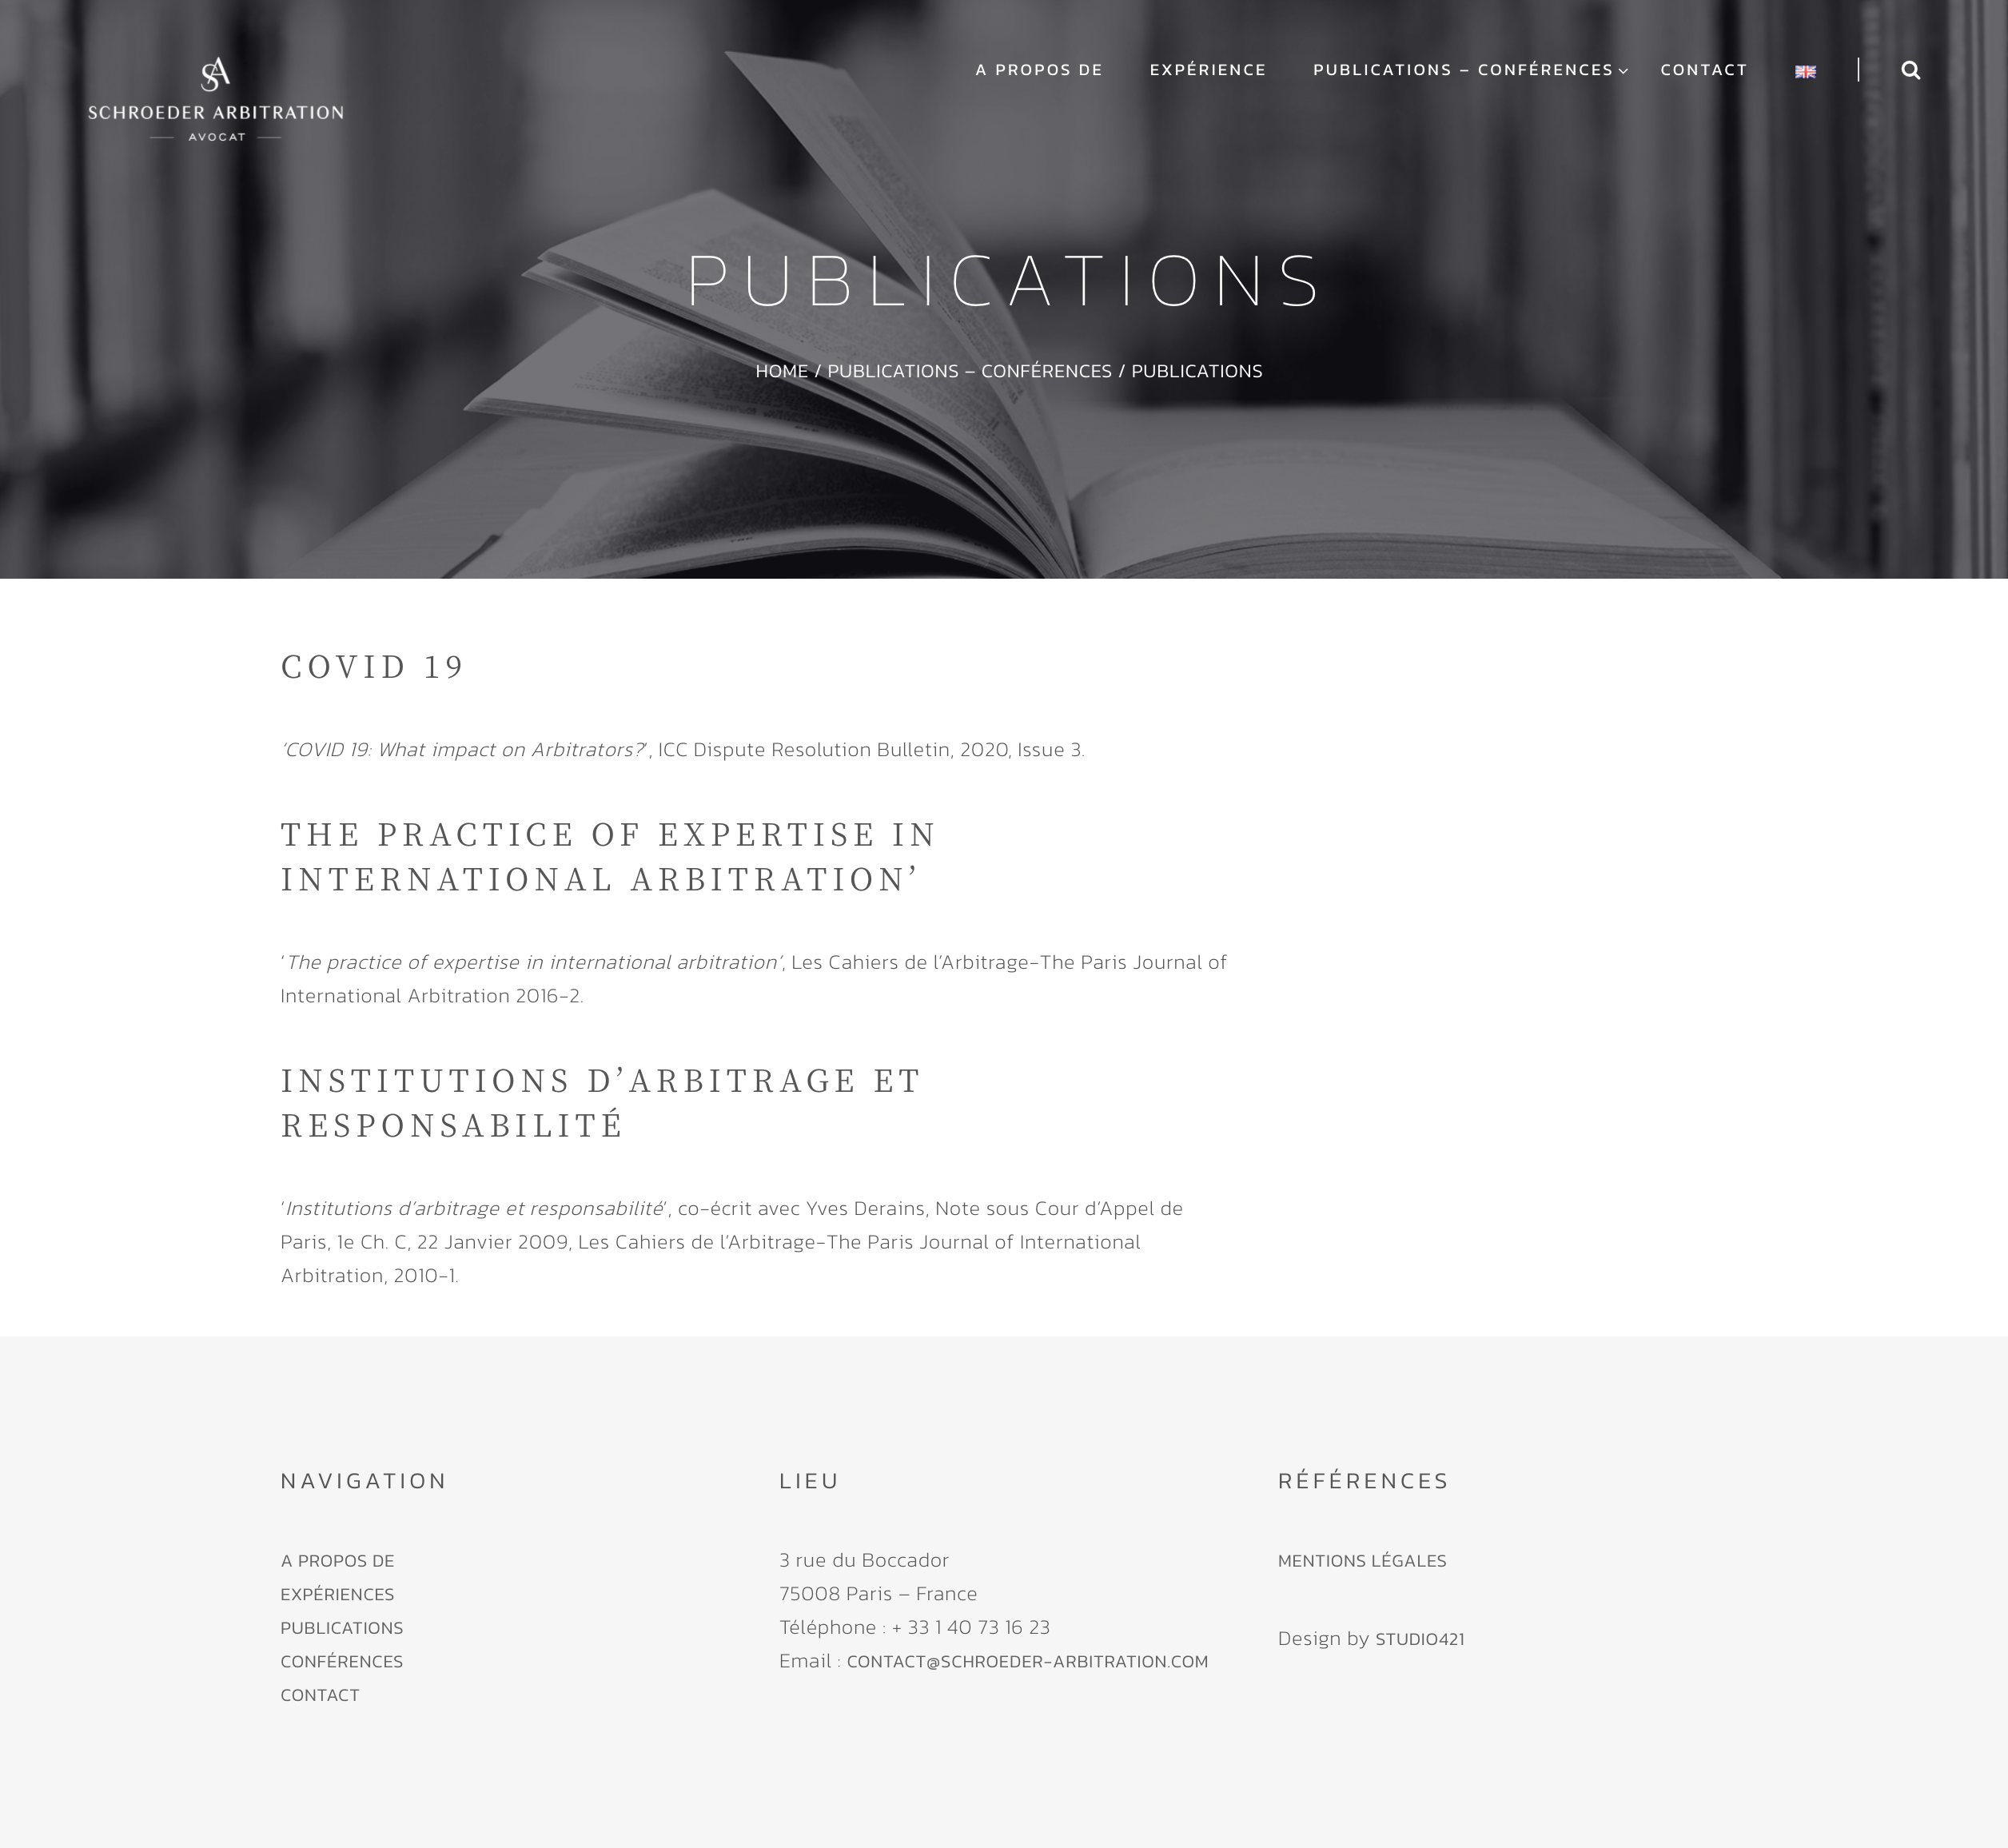 schroeder-arbitration.com- publications- studio421